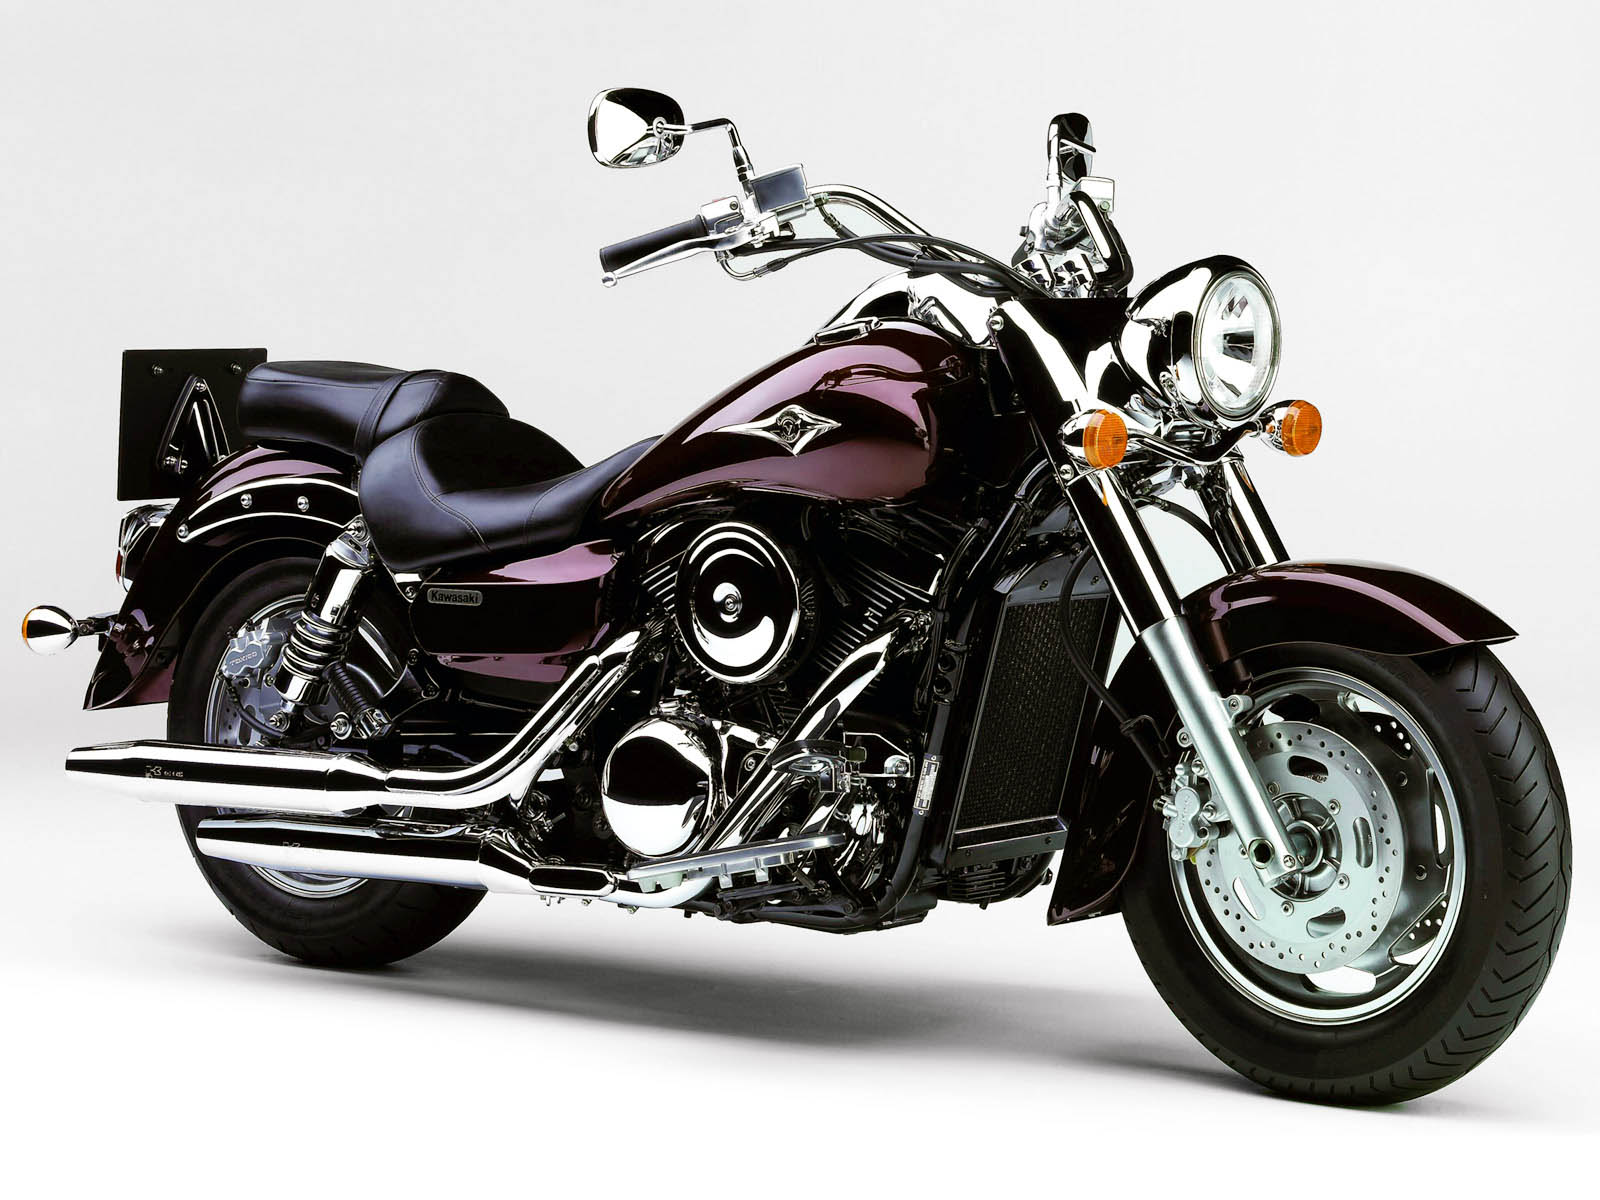 wallpapers: Kawasaki Vulcan 1600 Classic Bike